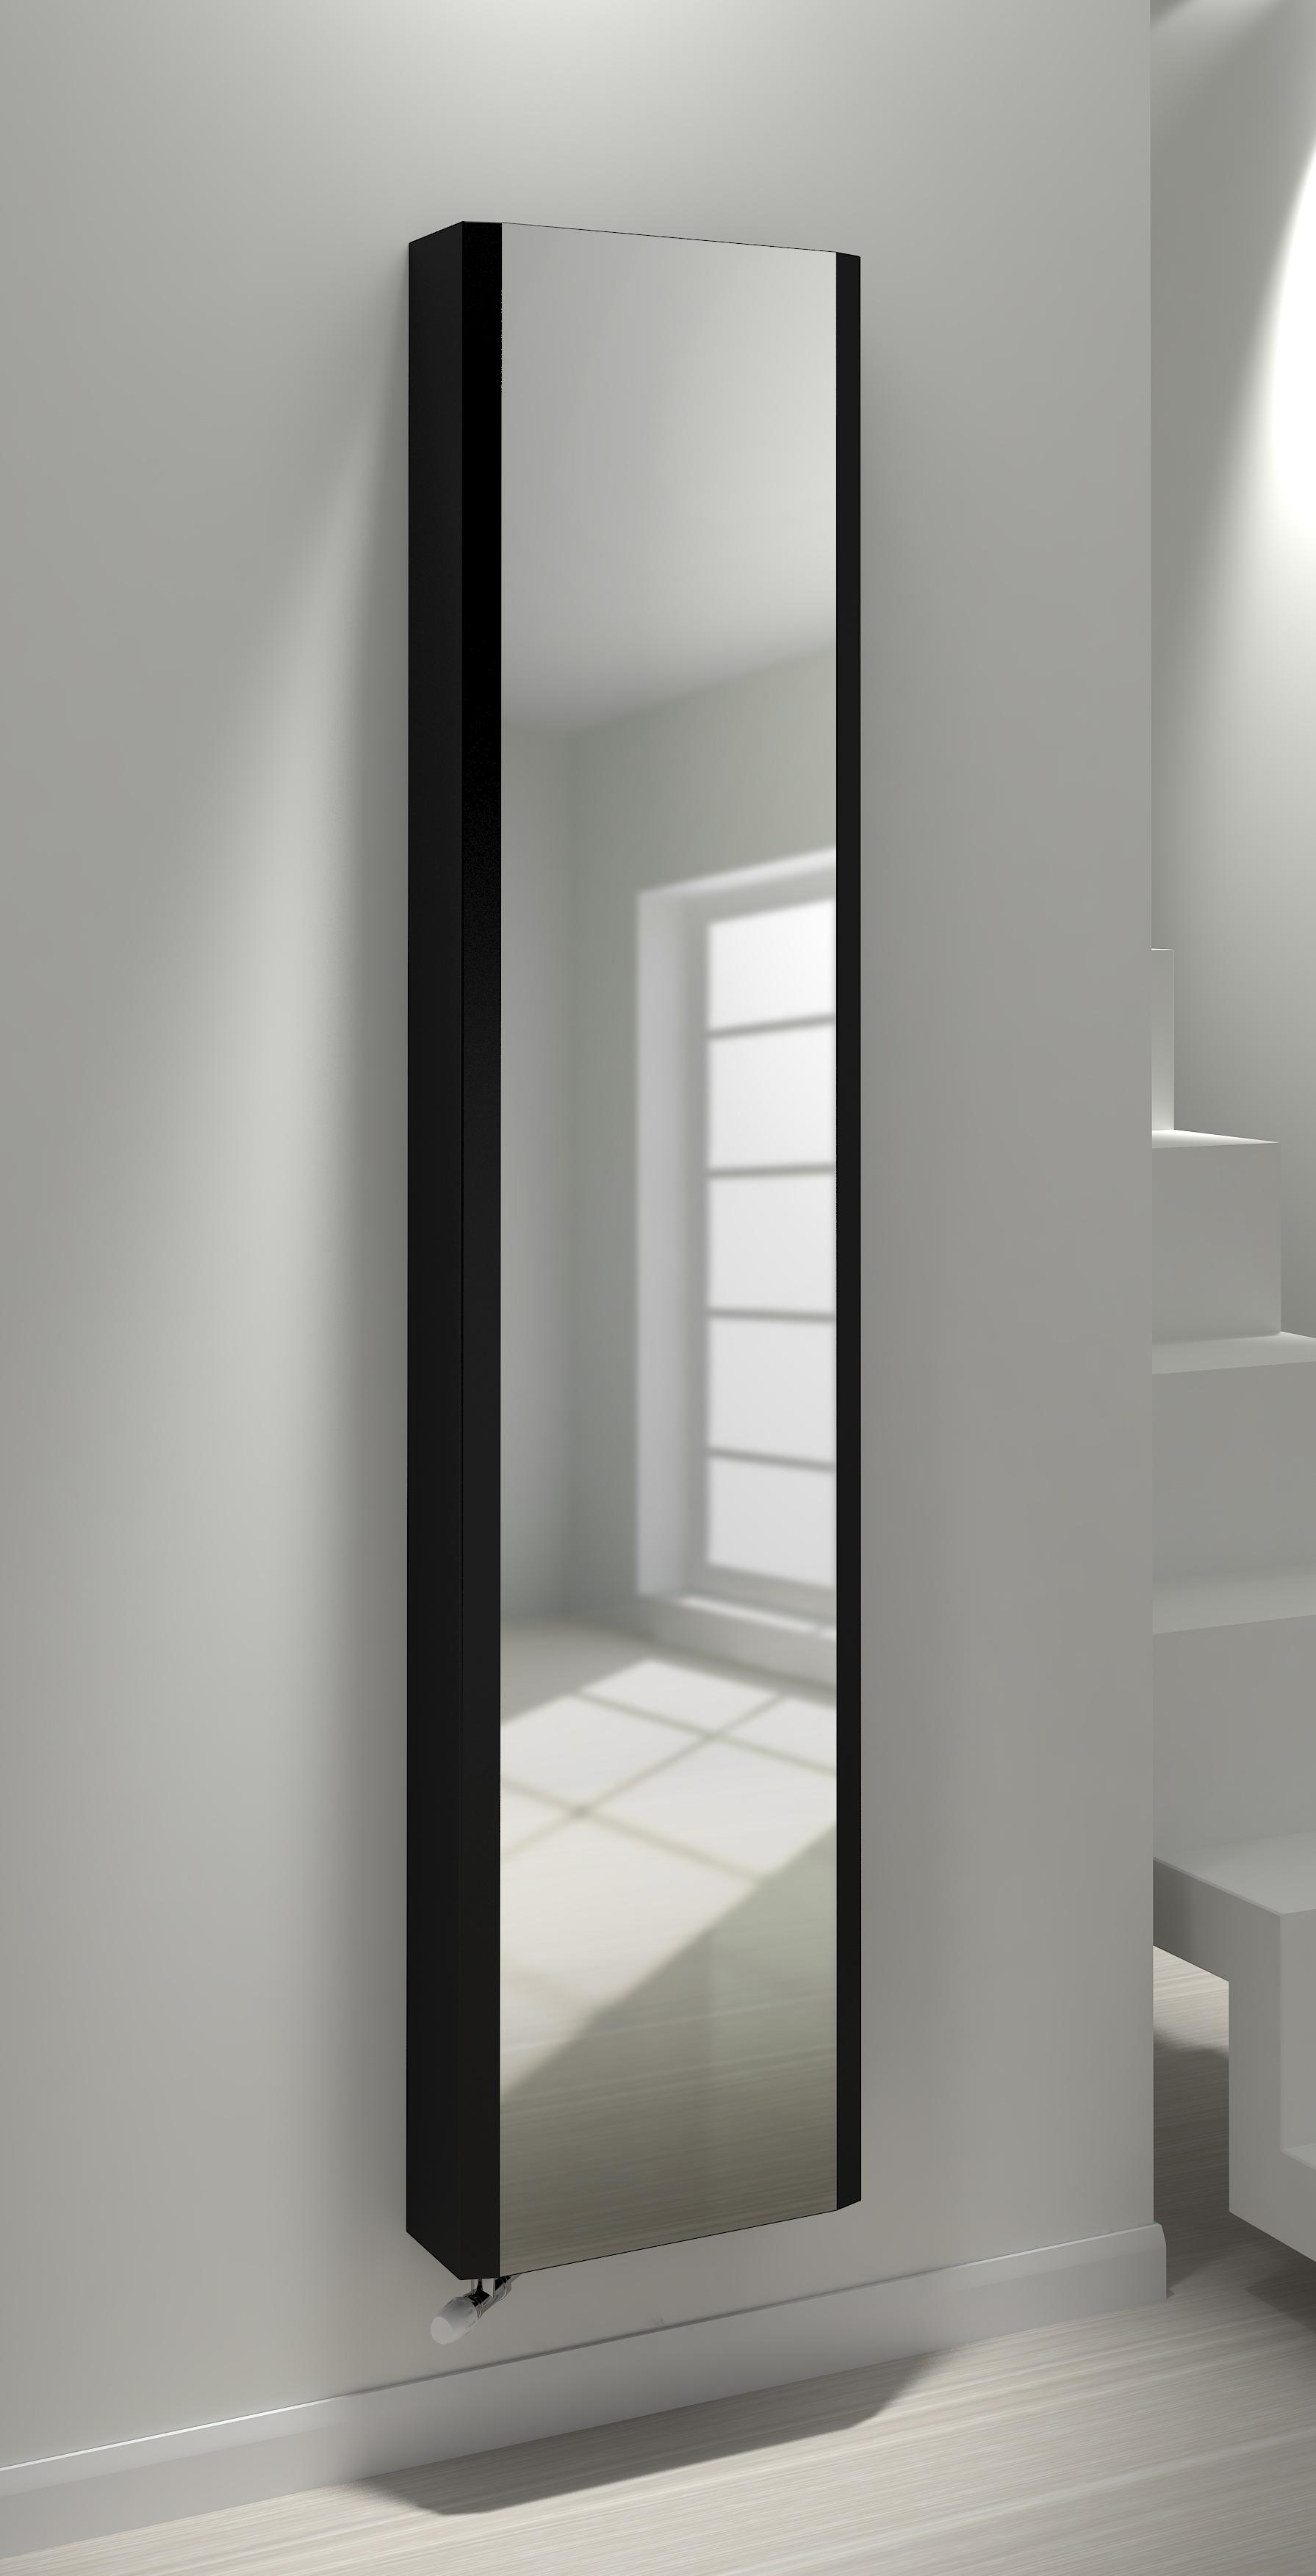 Kudox cassano vertical mirror radiator black 1800x400mm for Mirror radiator